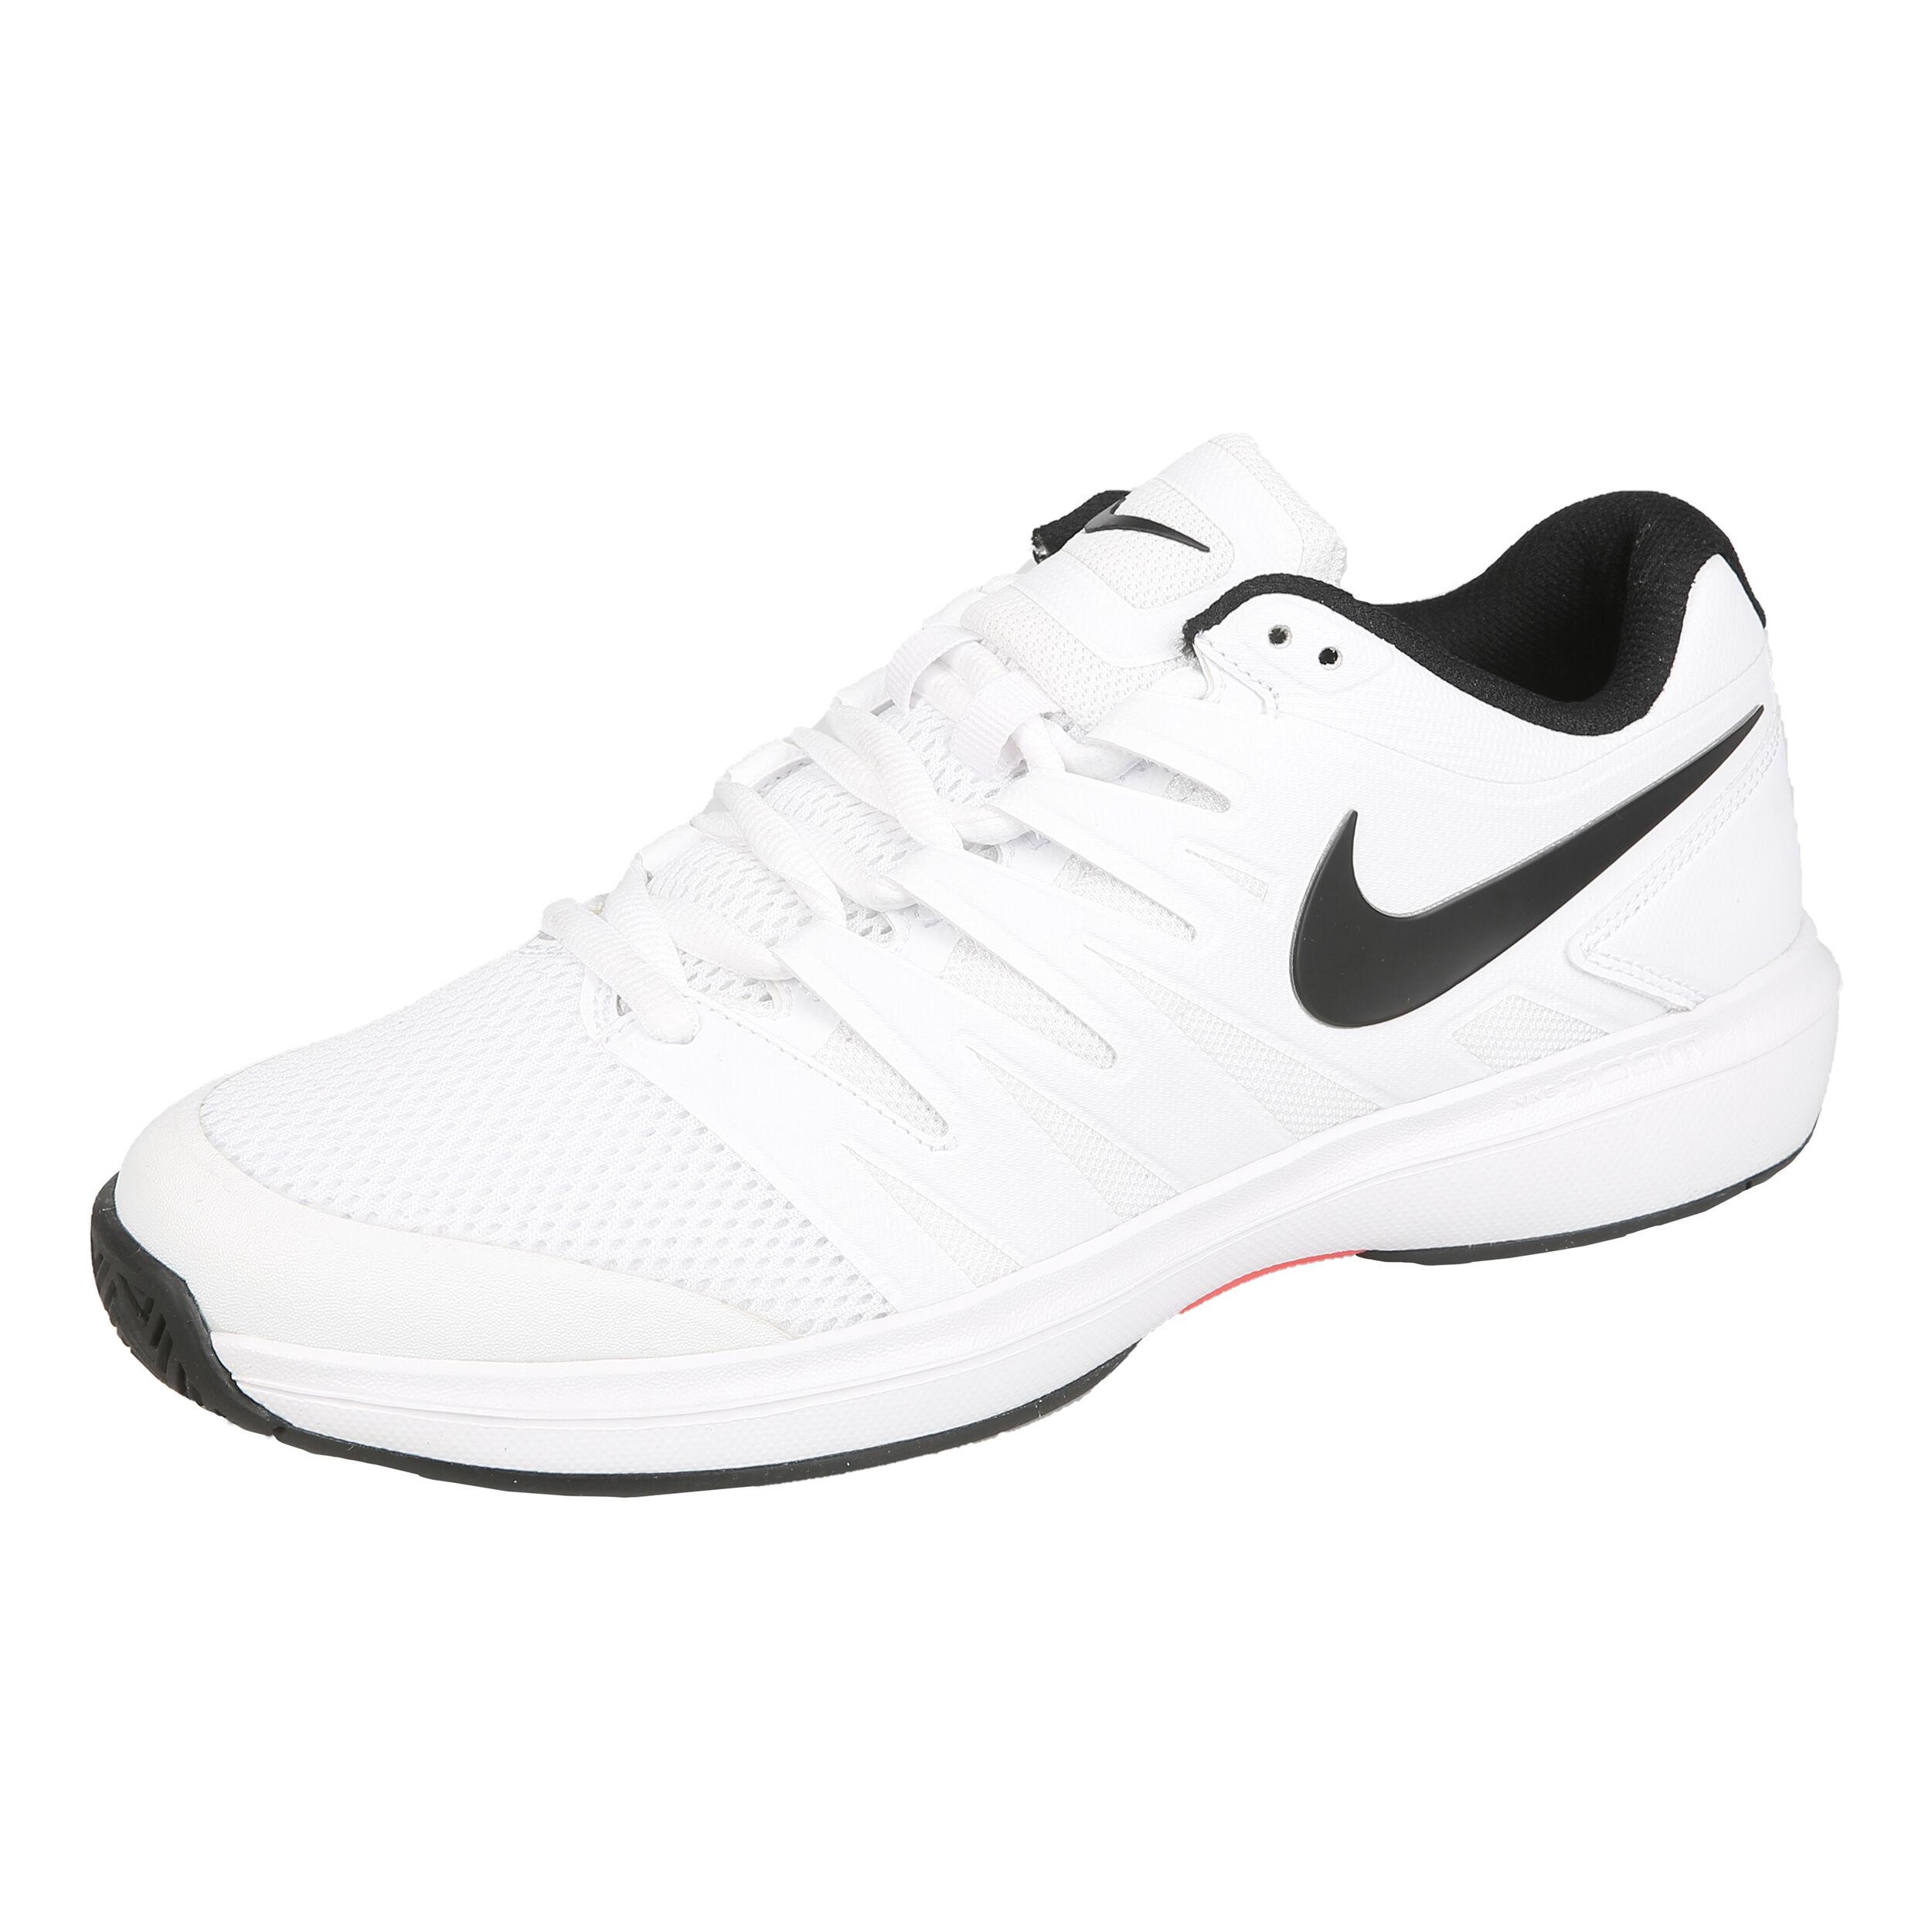 Nike Air Zoom Prestige HC Allcourt sko Herrer Hvid, Sort